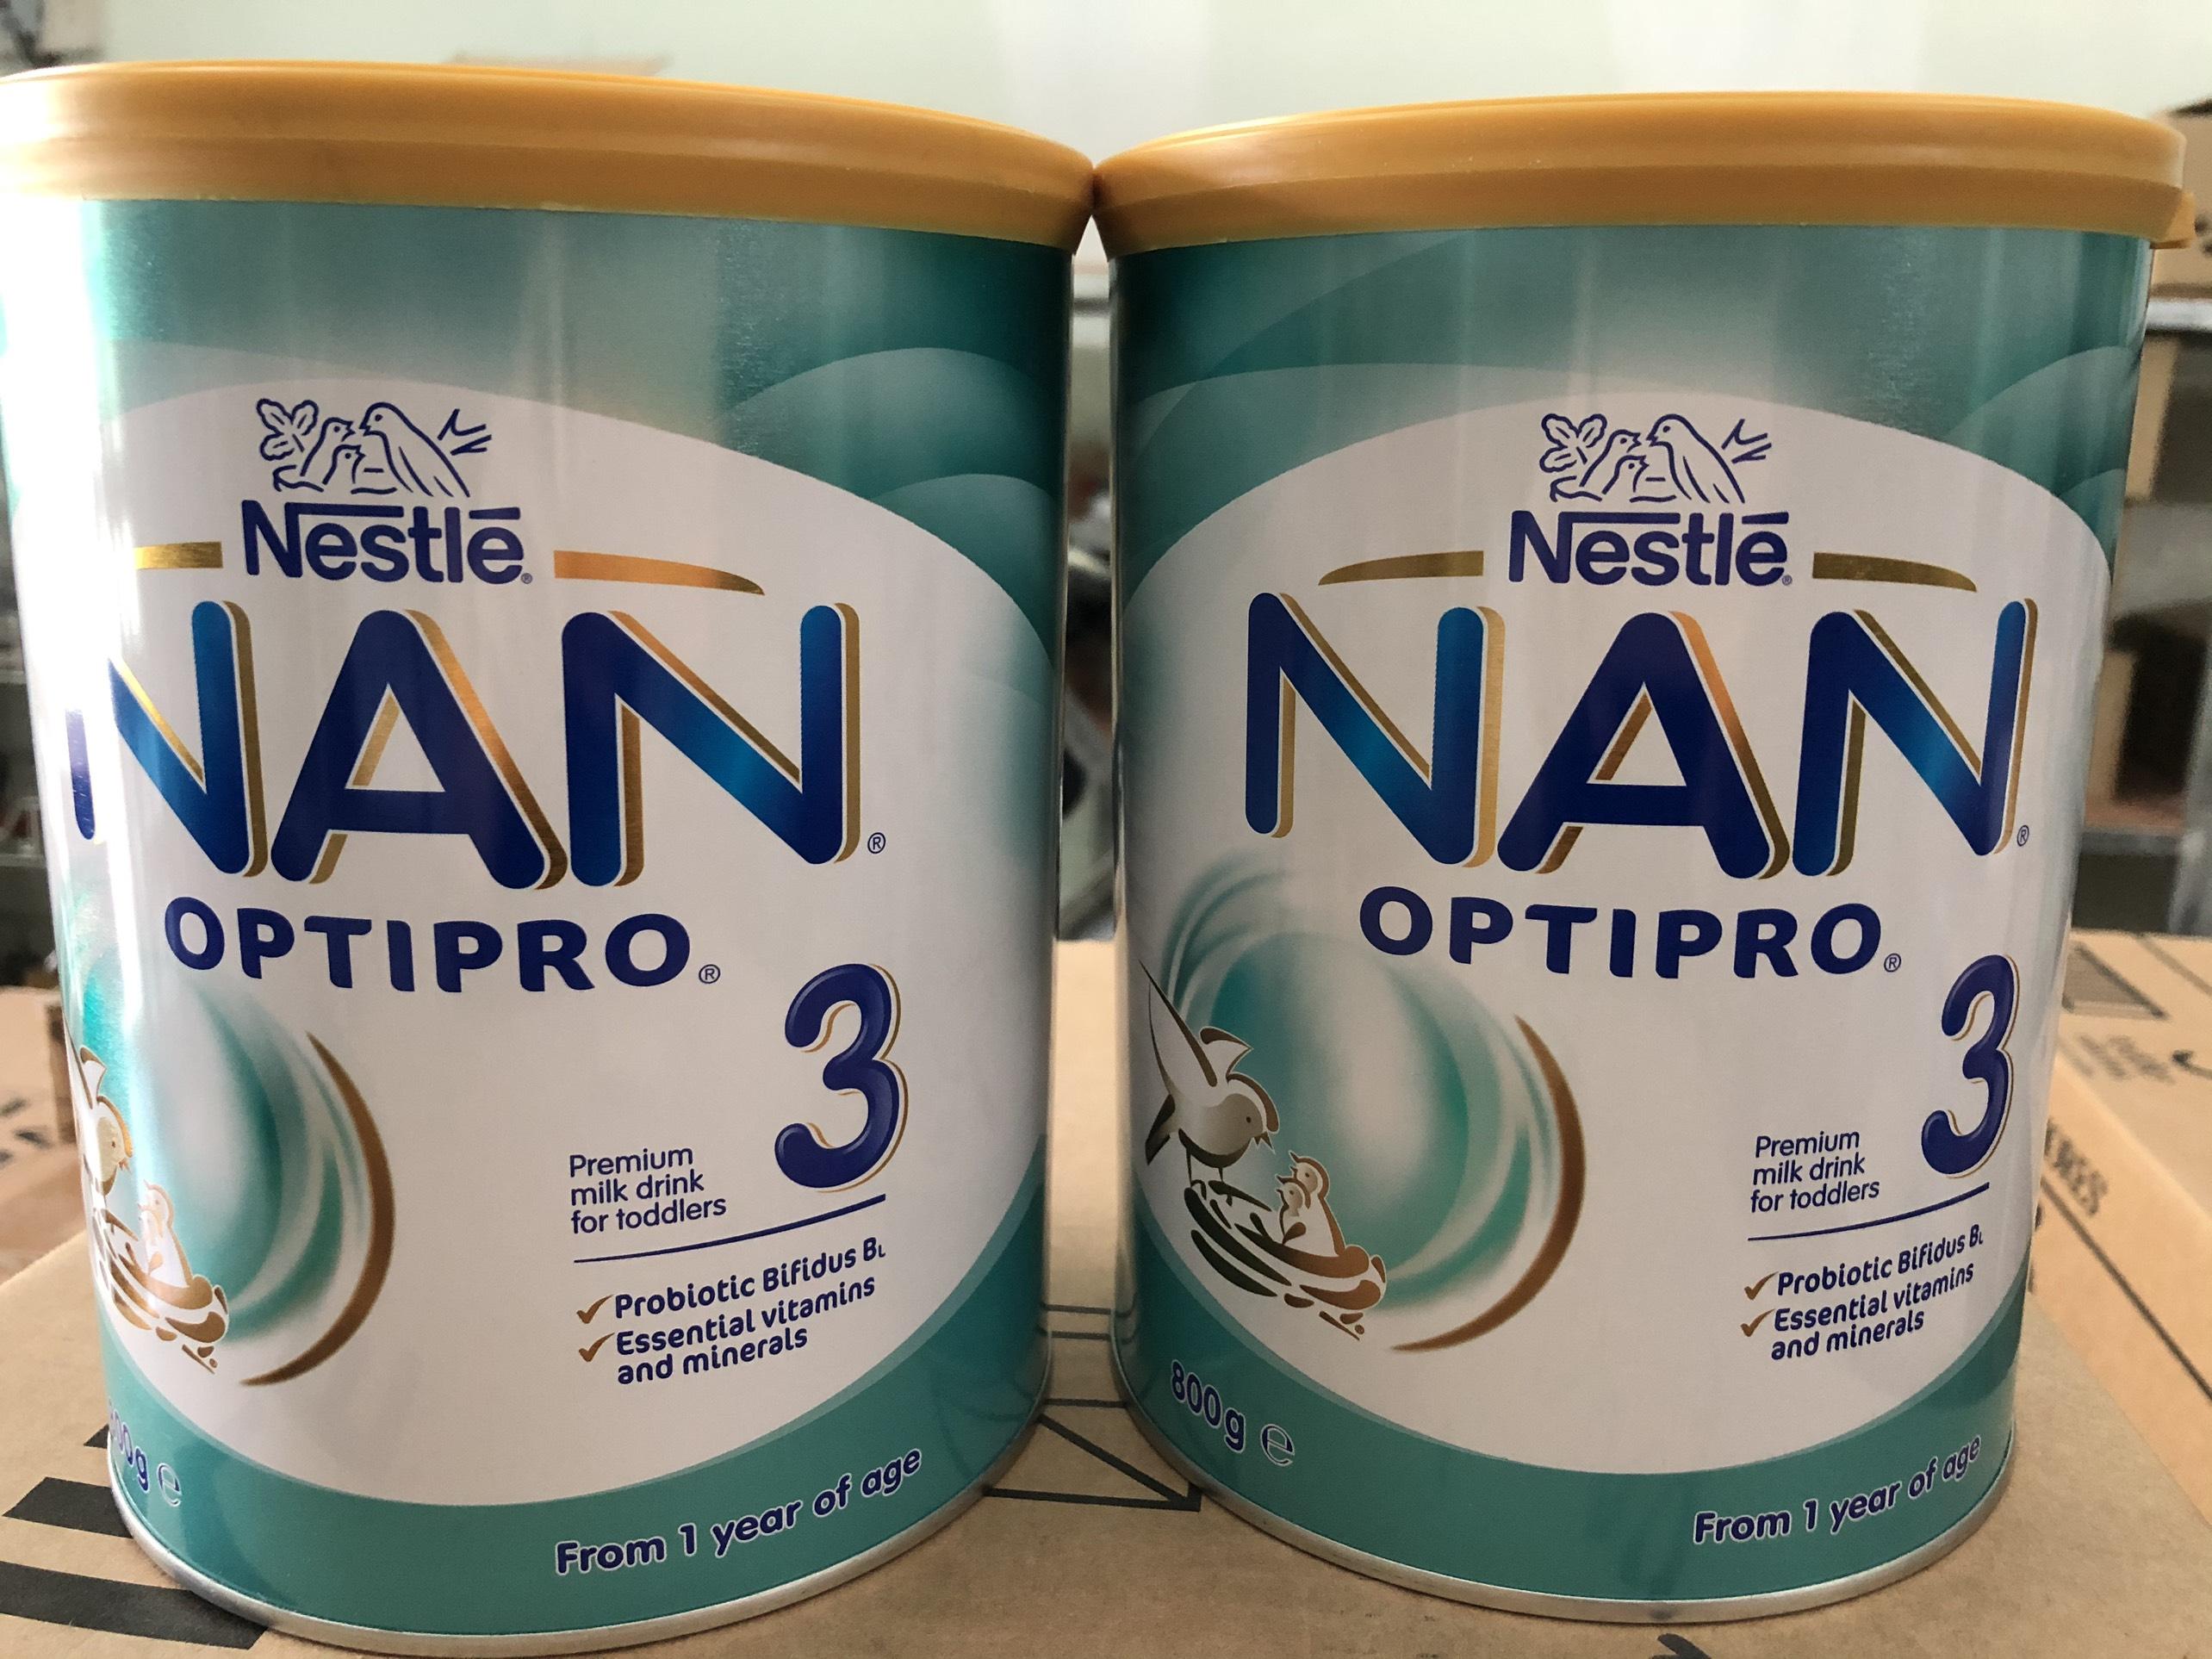 SPDD Nan Optipro 3 (Úc)